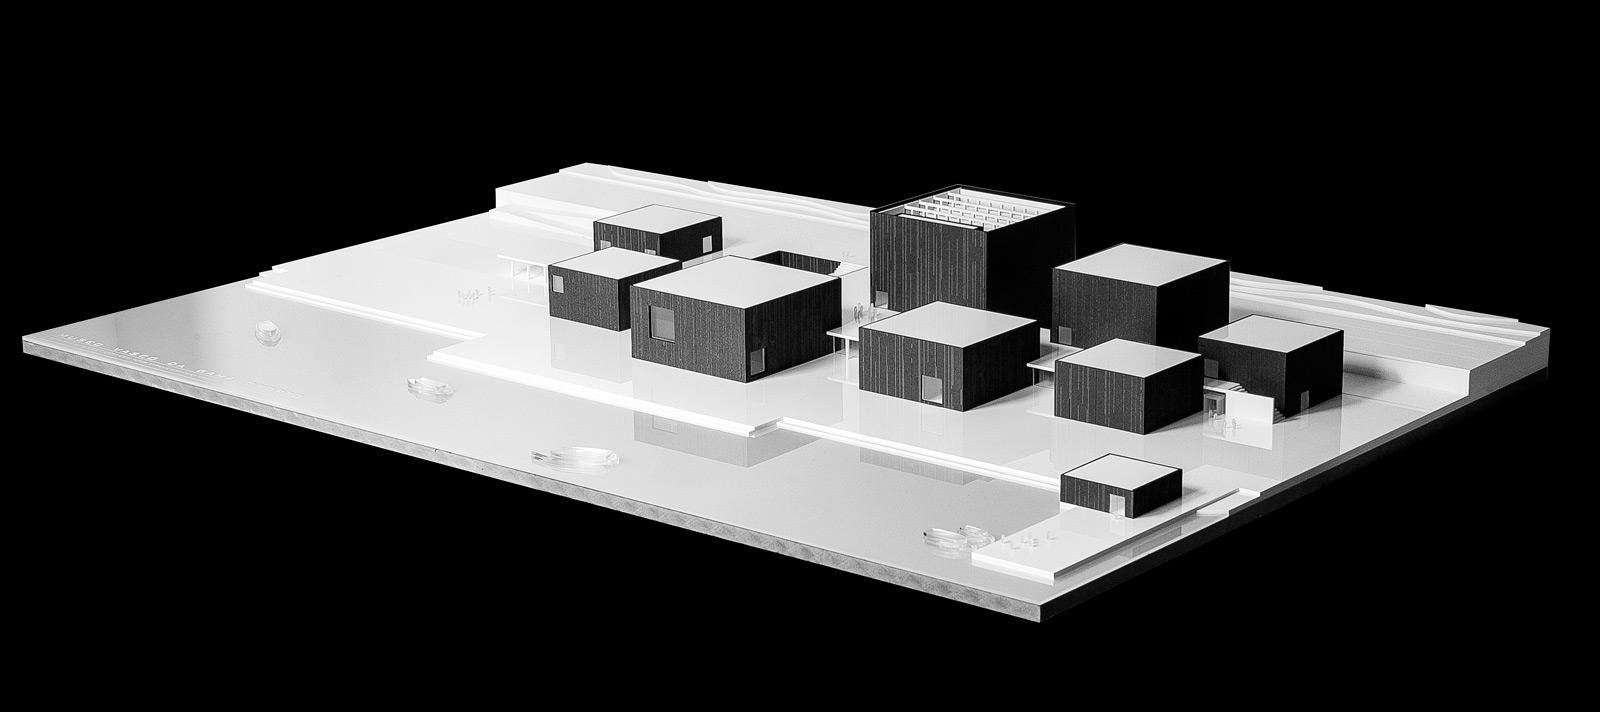 maqueta-arquitectura-valencia-arquiayuda-arquimaqueta-museo-fluvial-en-oporto-architecture-model (6)